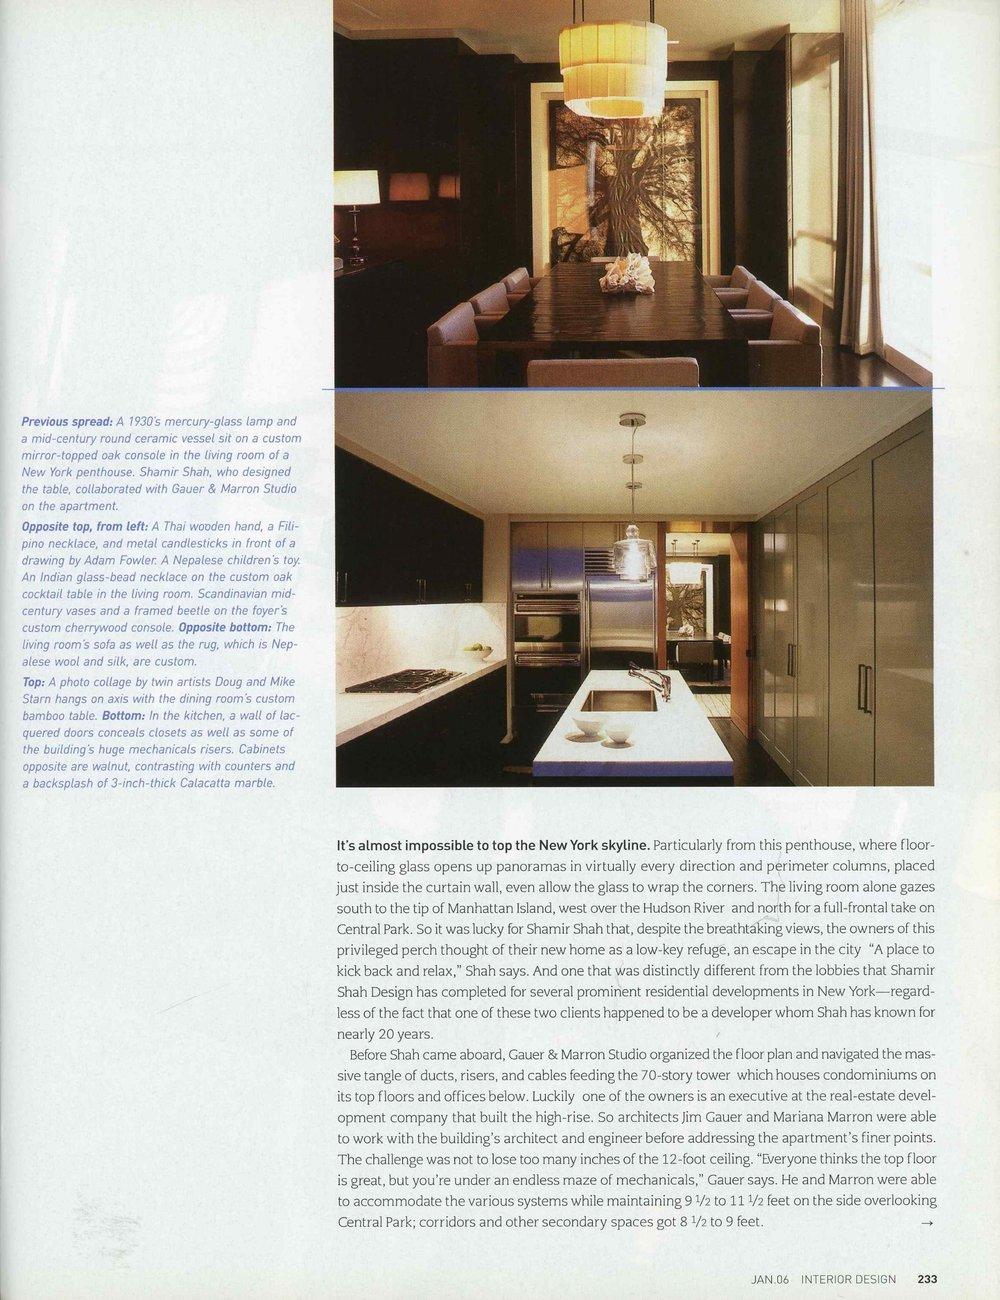 Interior Design_Jan 06_Full Article_Page_5.jpg